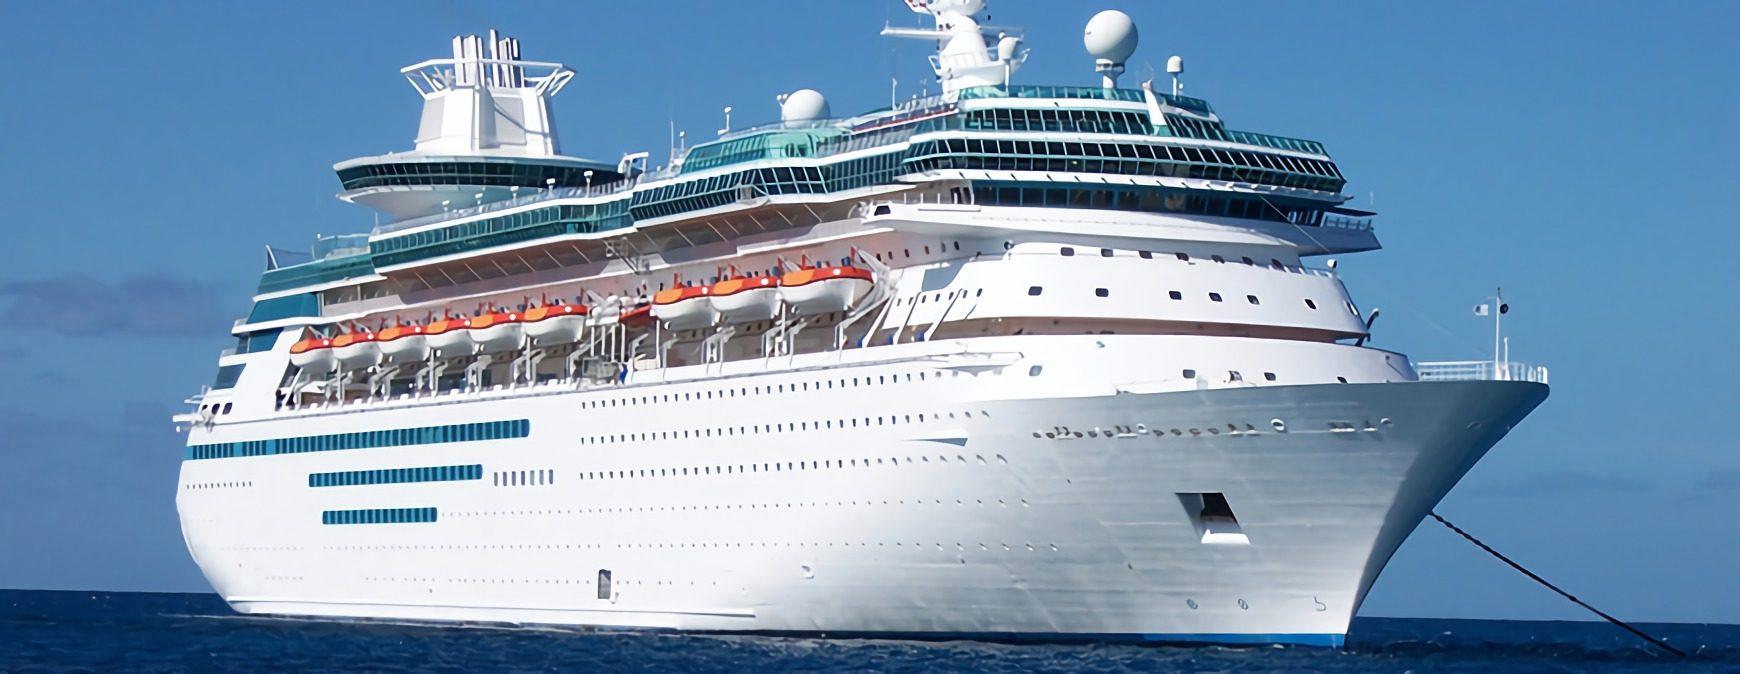 welding cruise ships